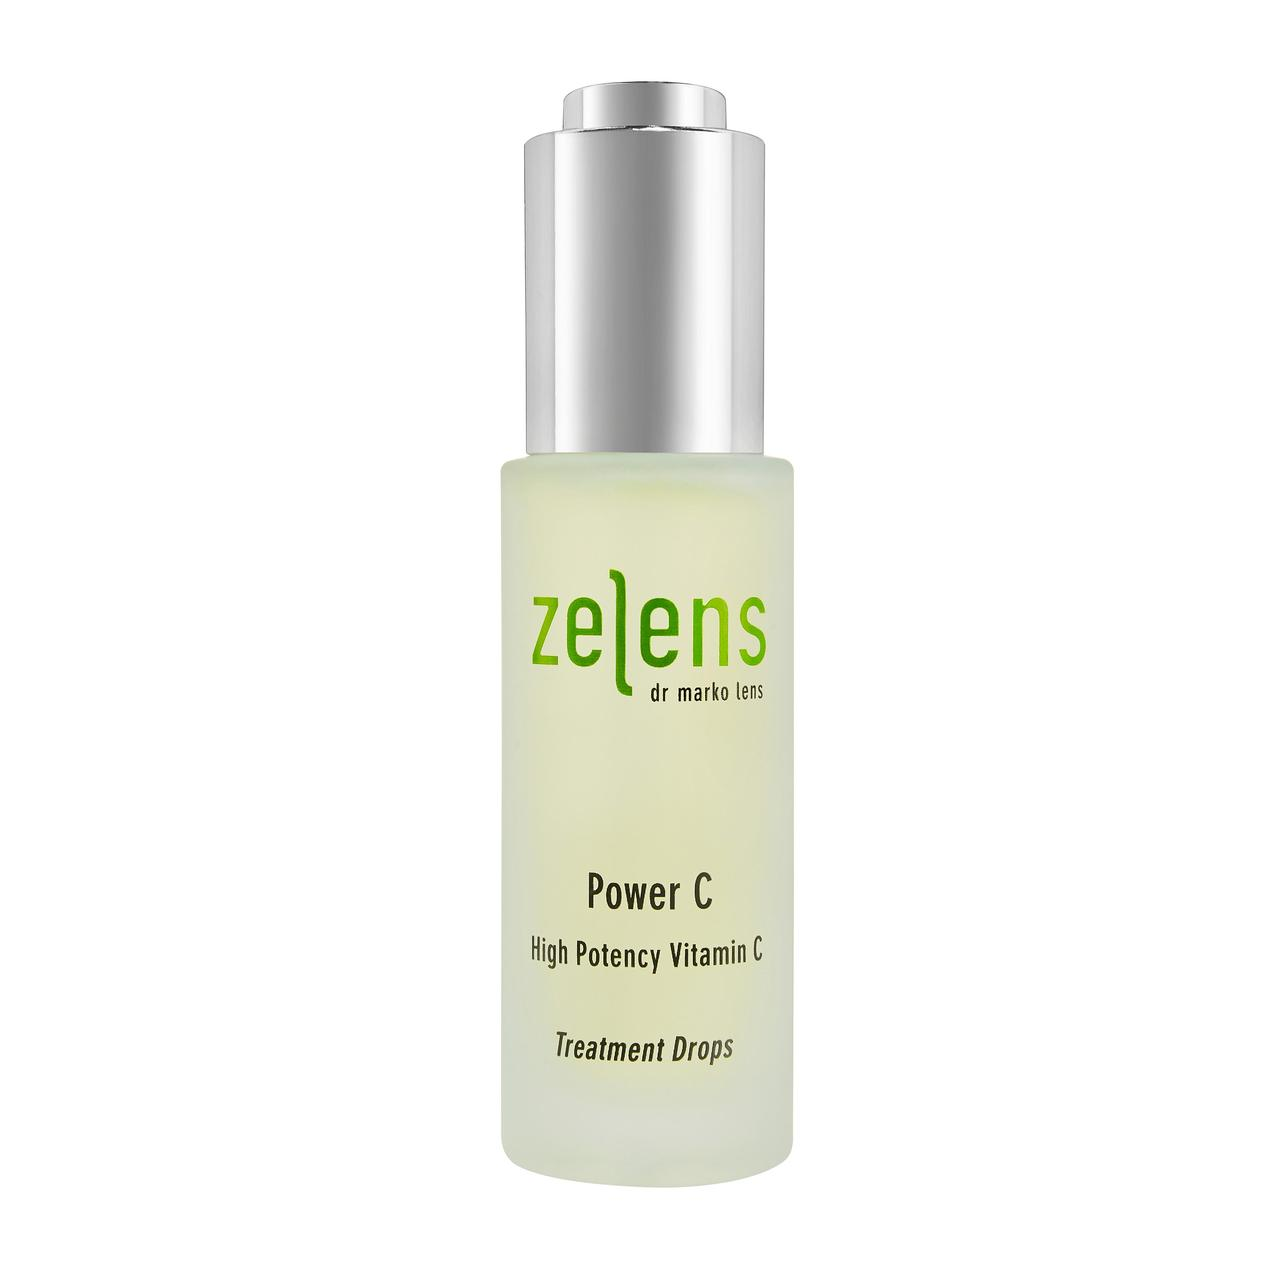 An image of Zelens Power C High Potency Vitamin C Treatment Drops